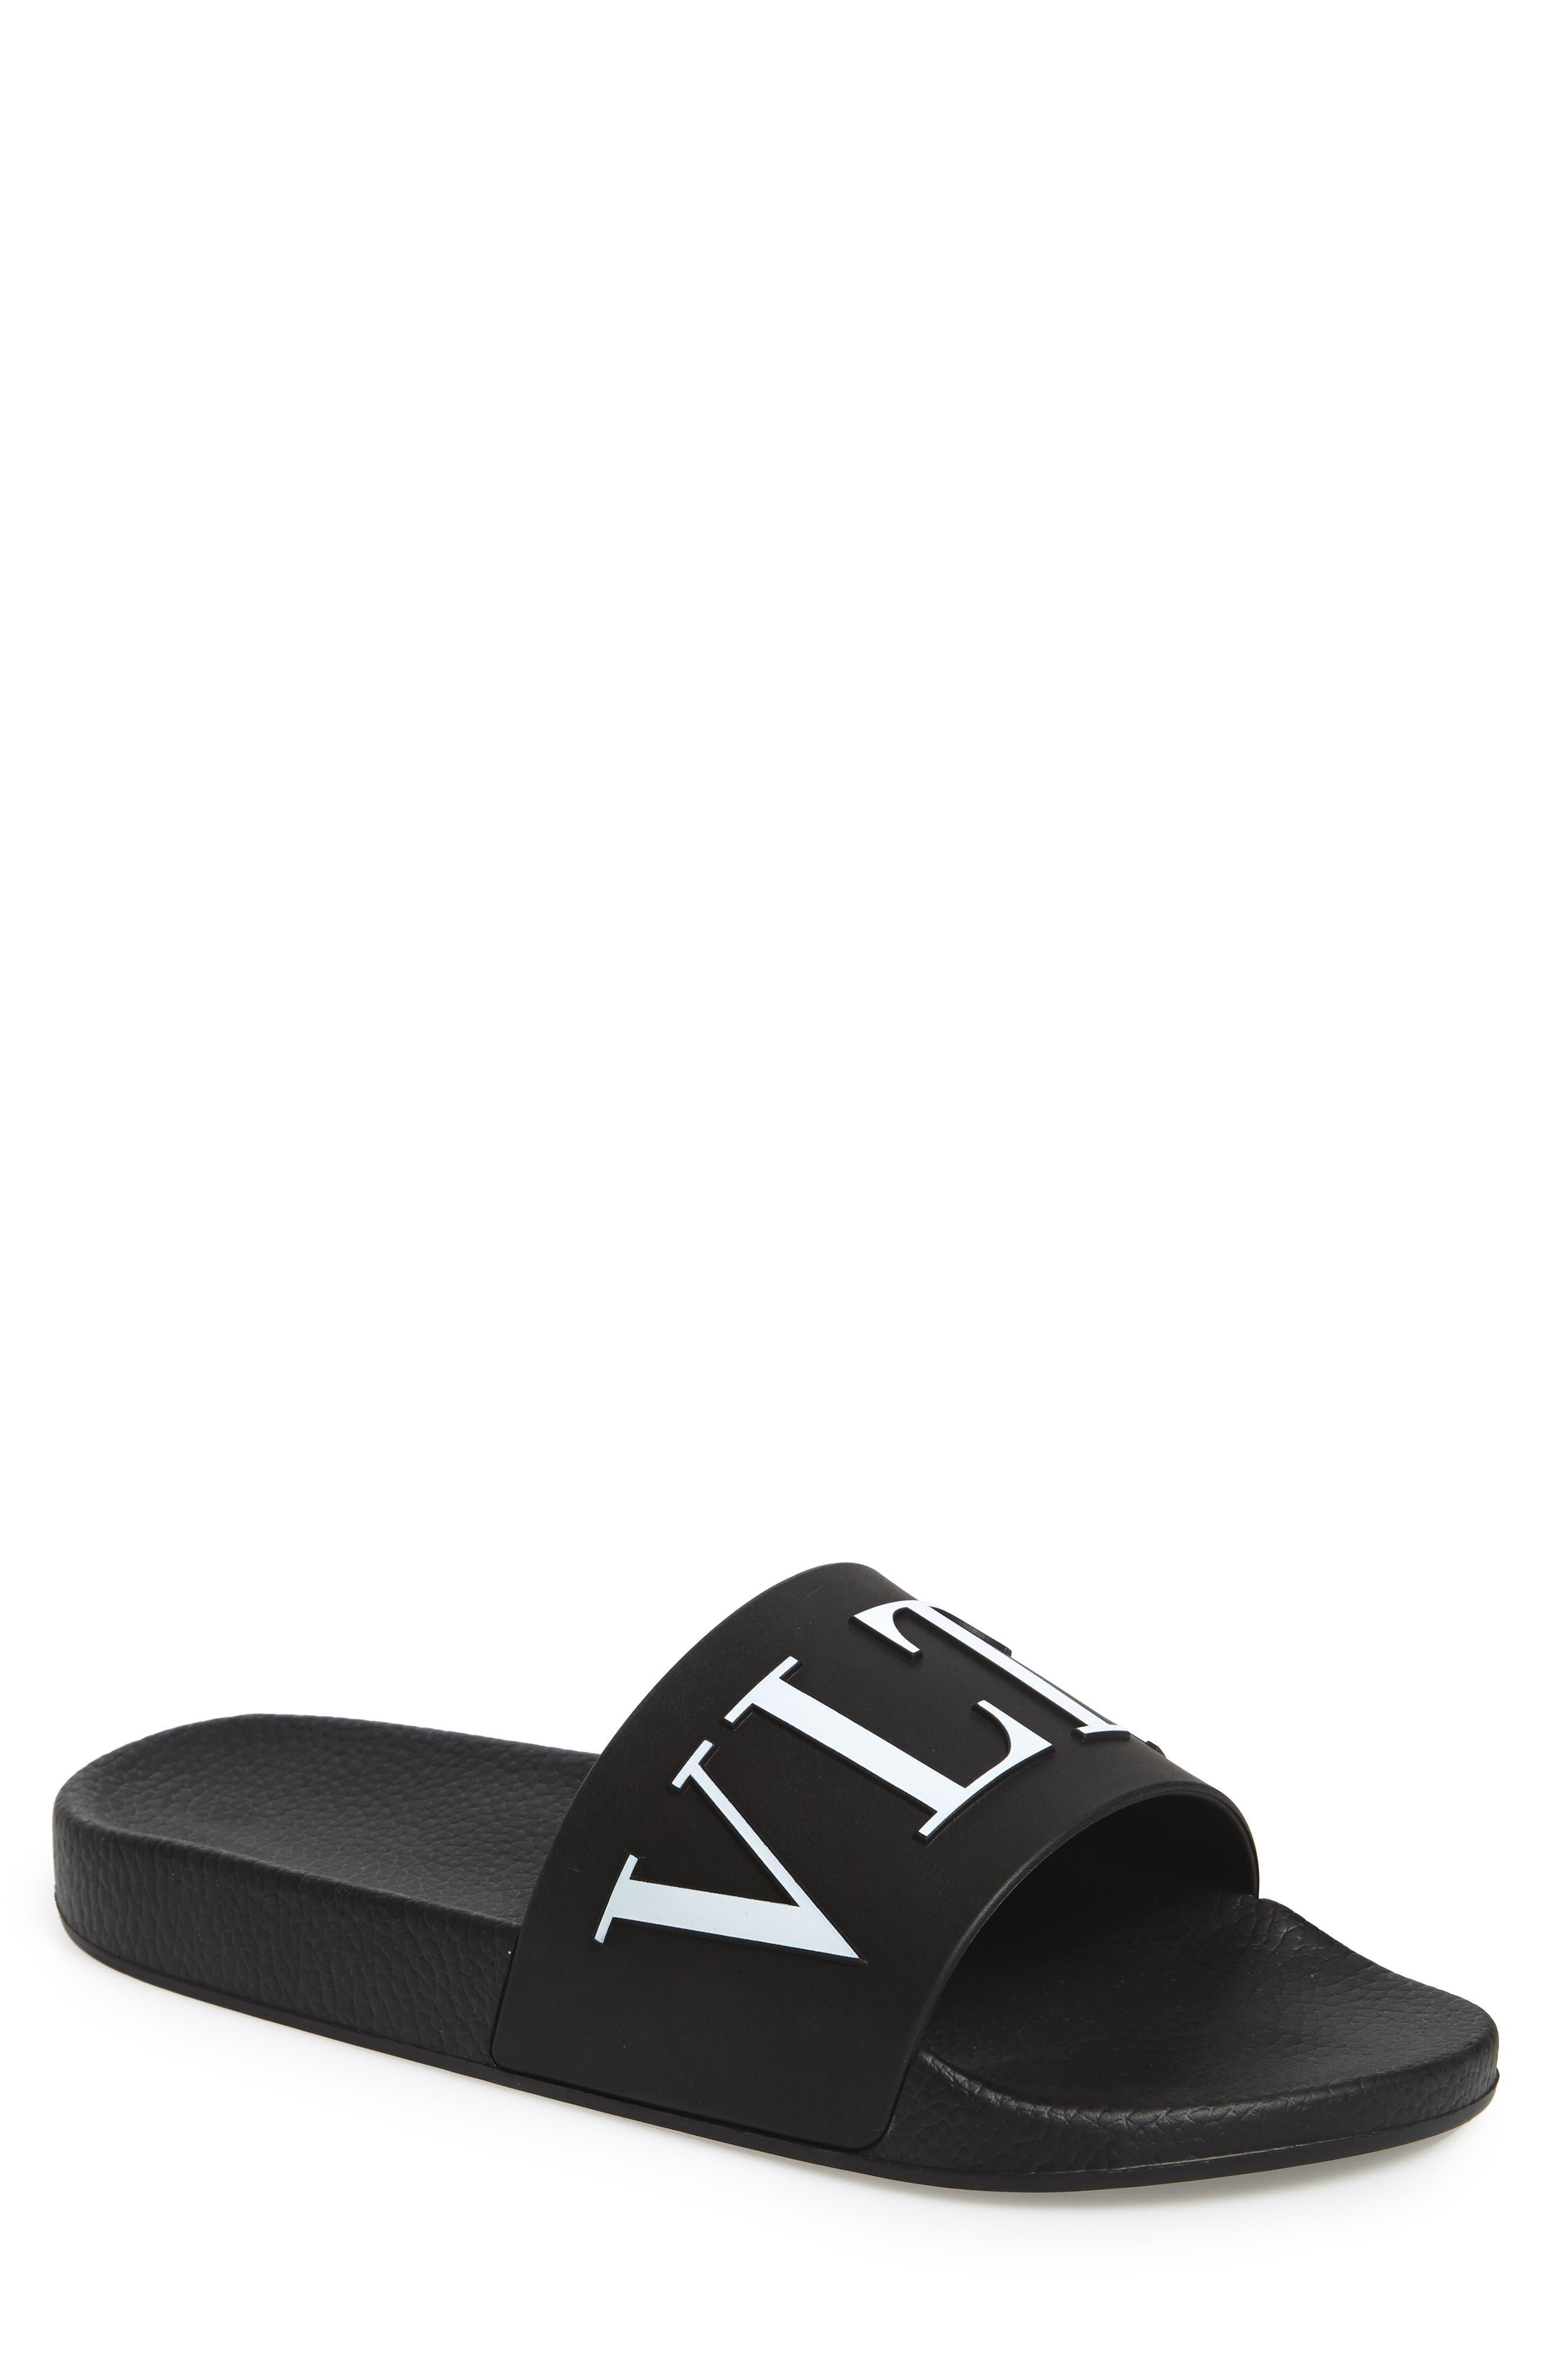 Slide Sandal,                         Main,                         color, NERO/ BIANCO